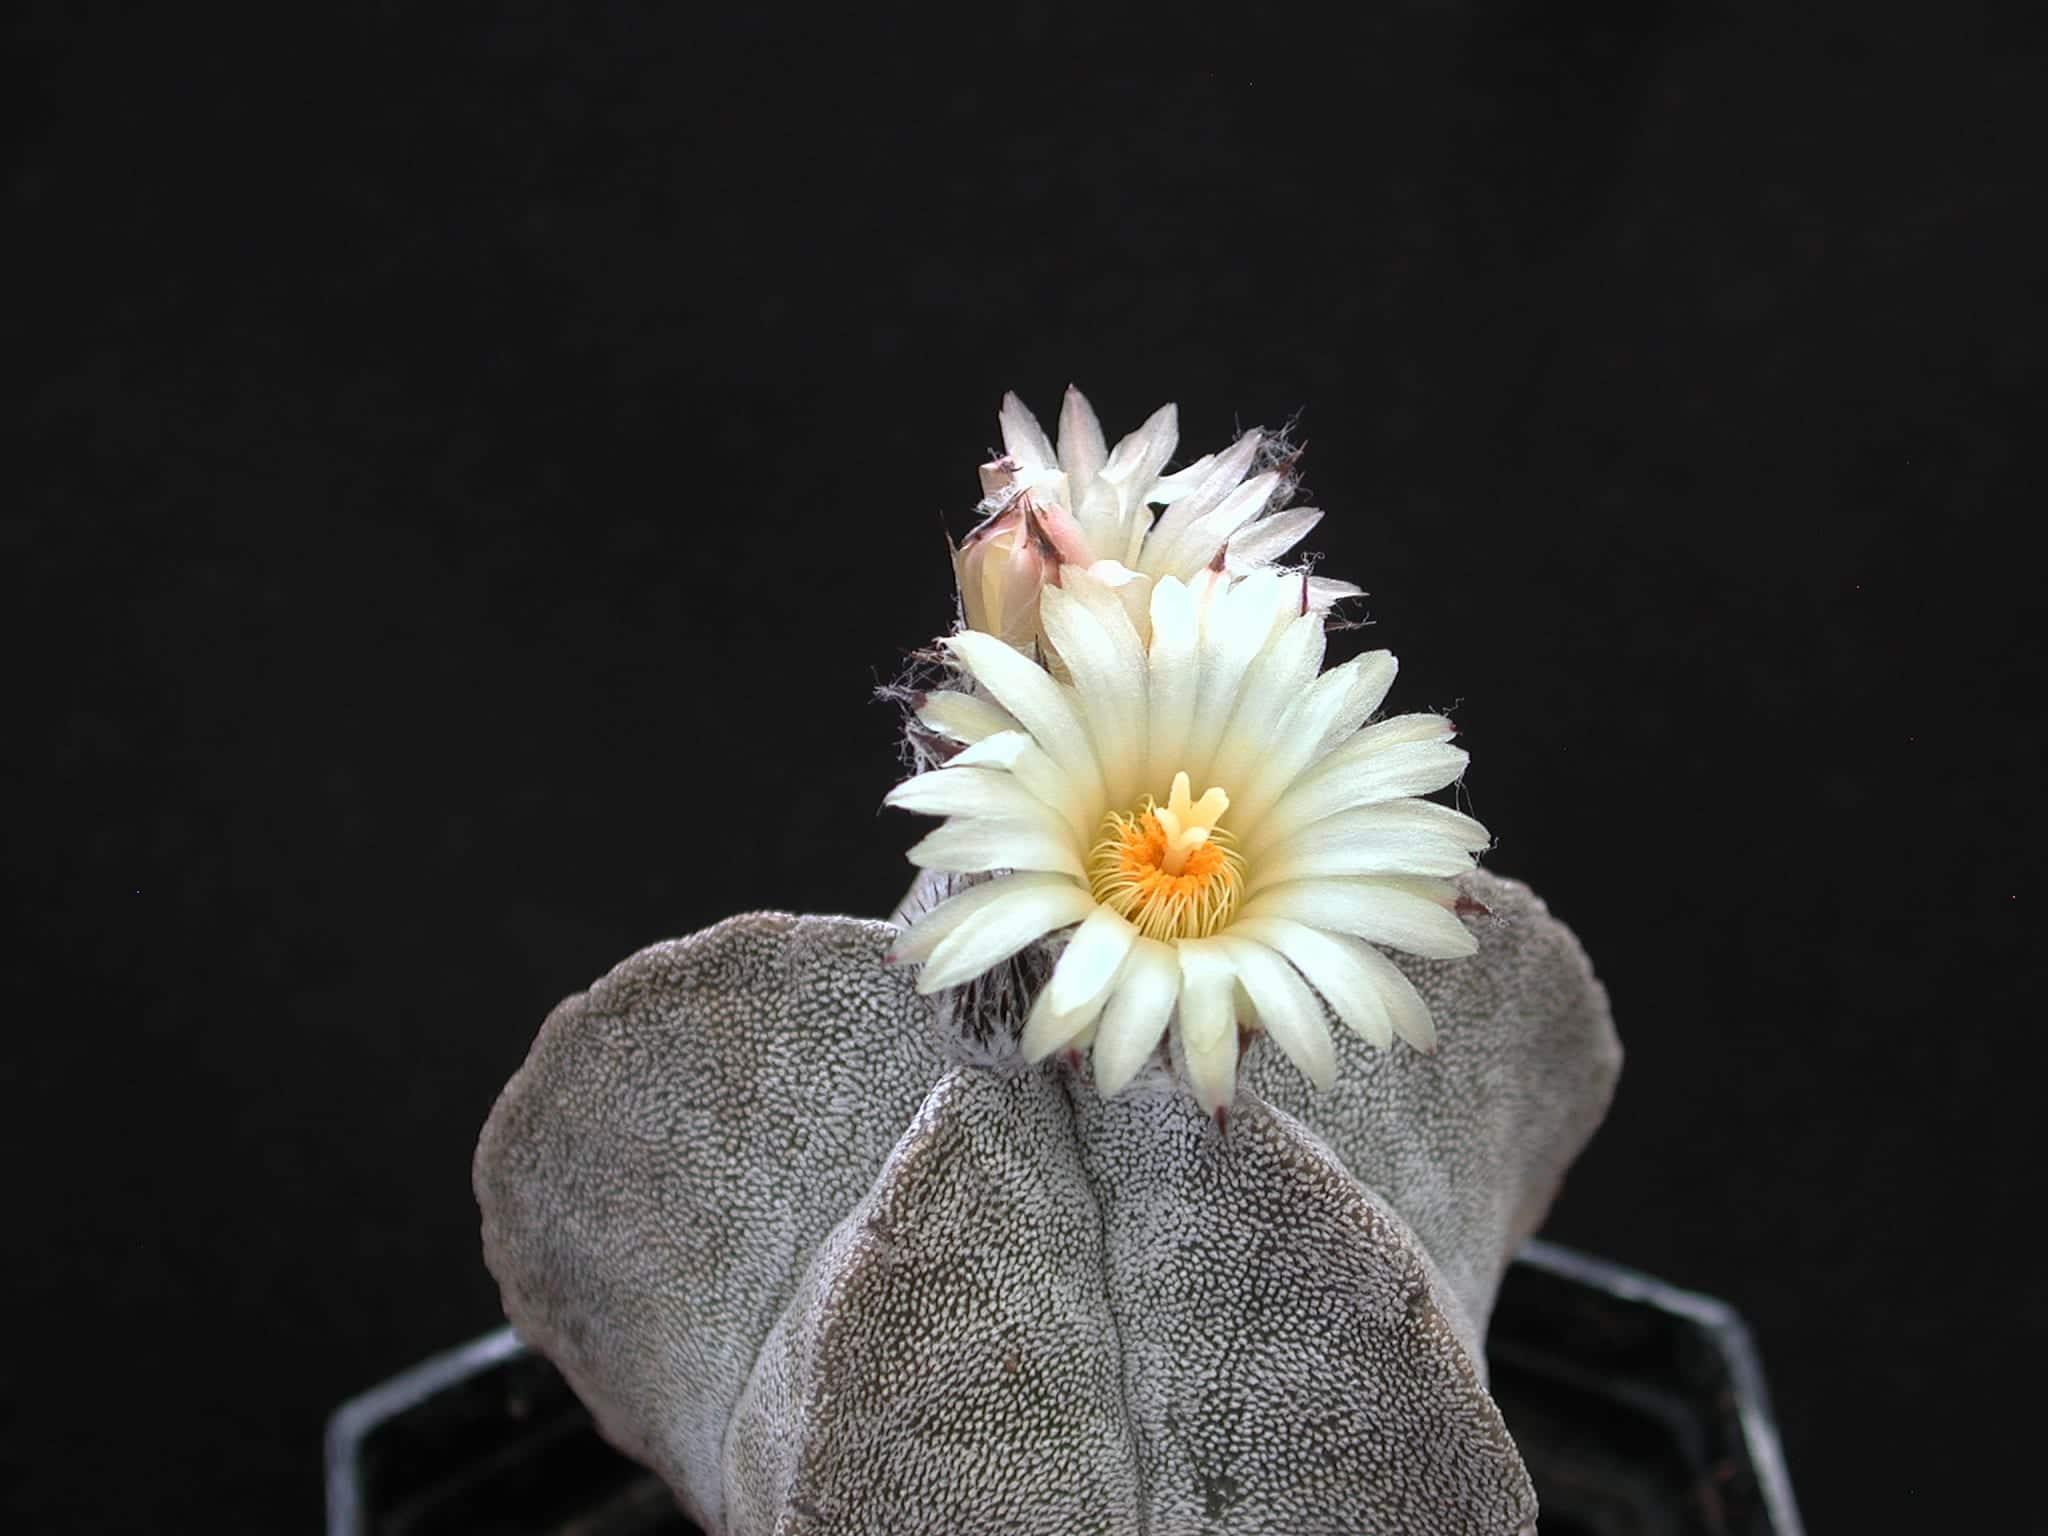 Vista del Astrophytum myriostigma